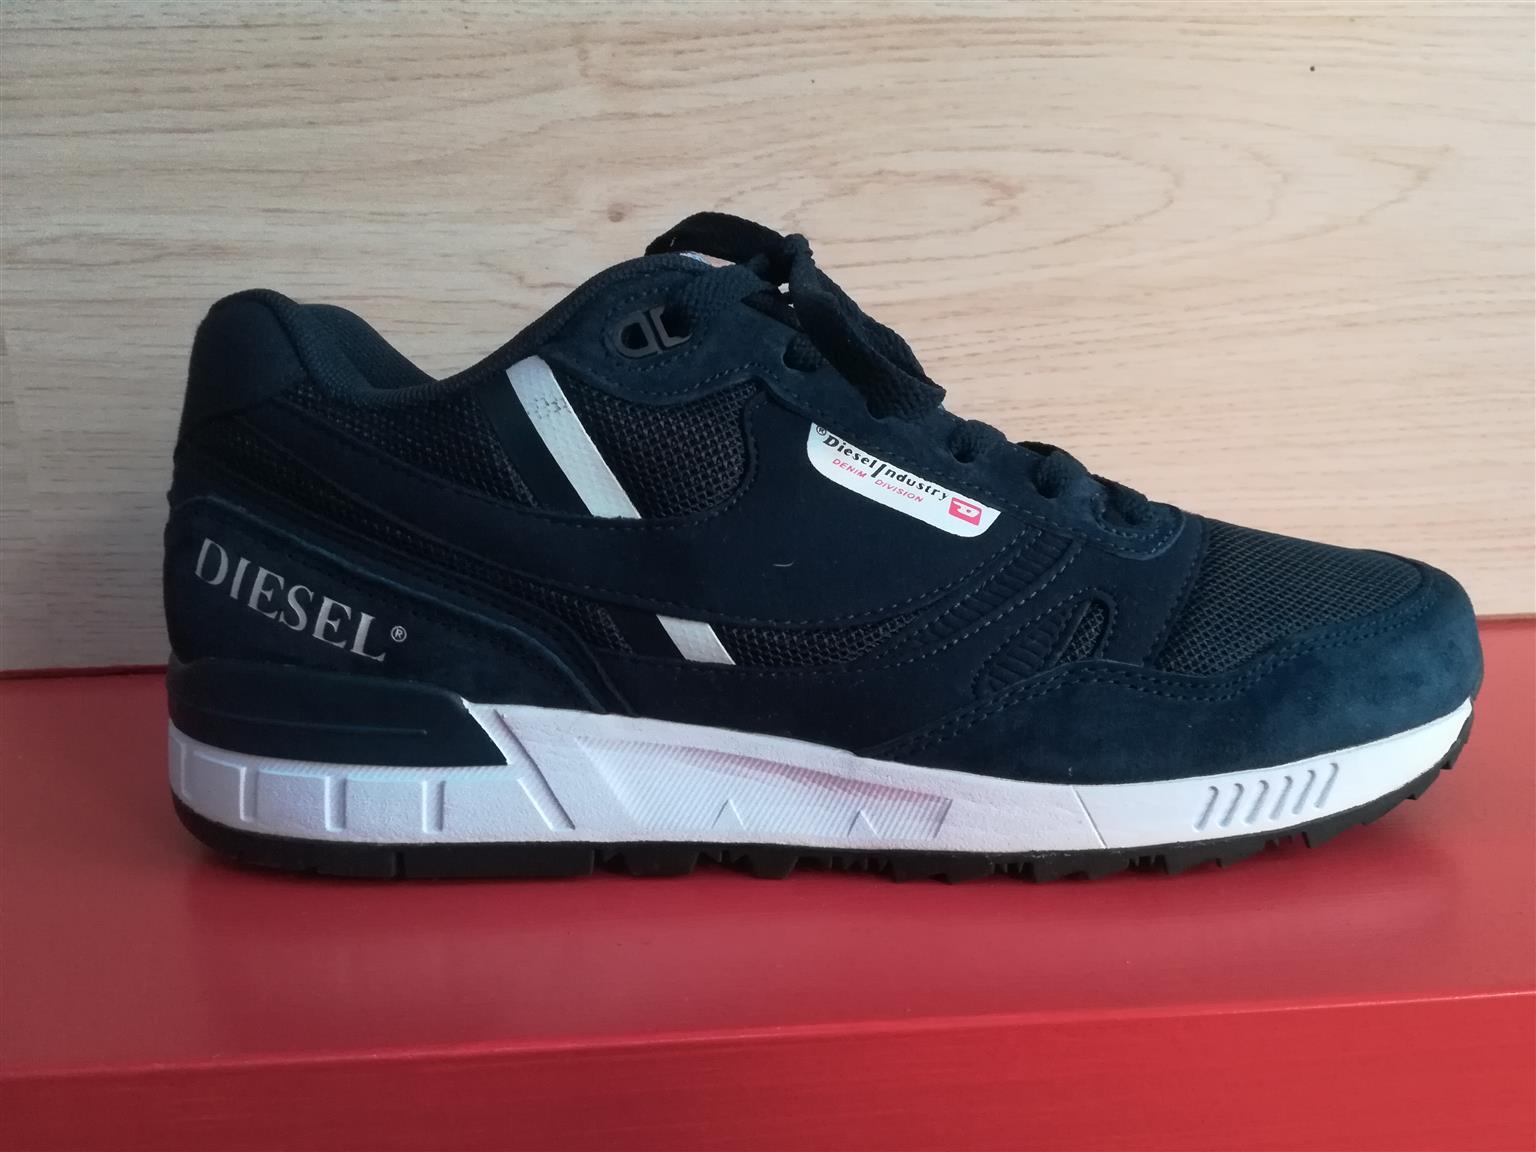 0a1352b5e99cf0 Diesel Sneakers for Sale R900